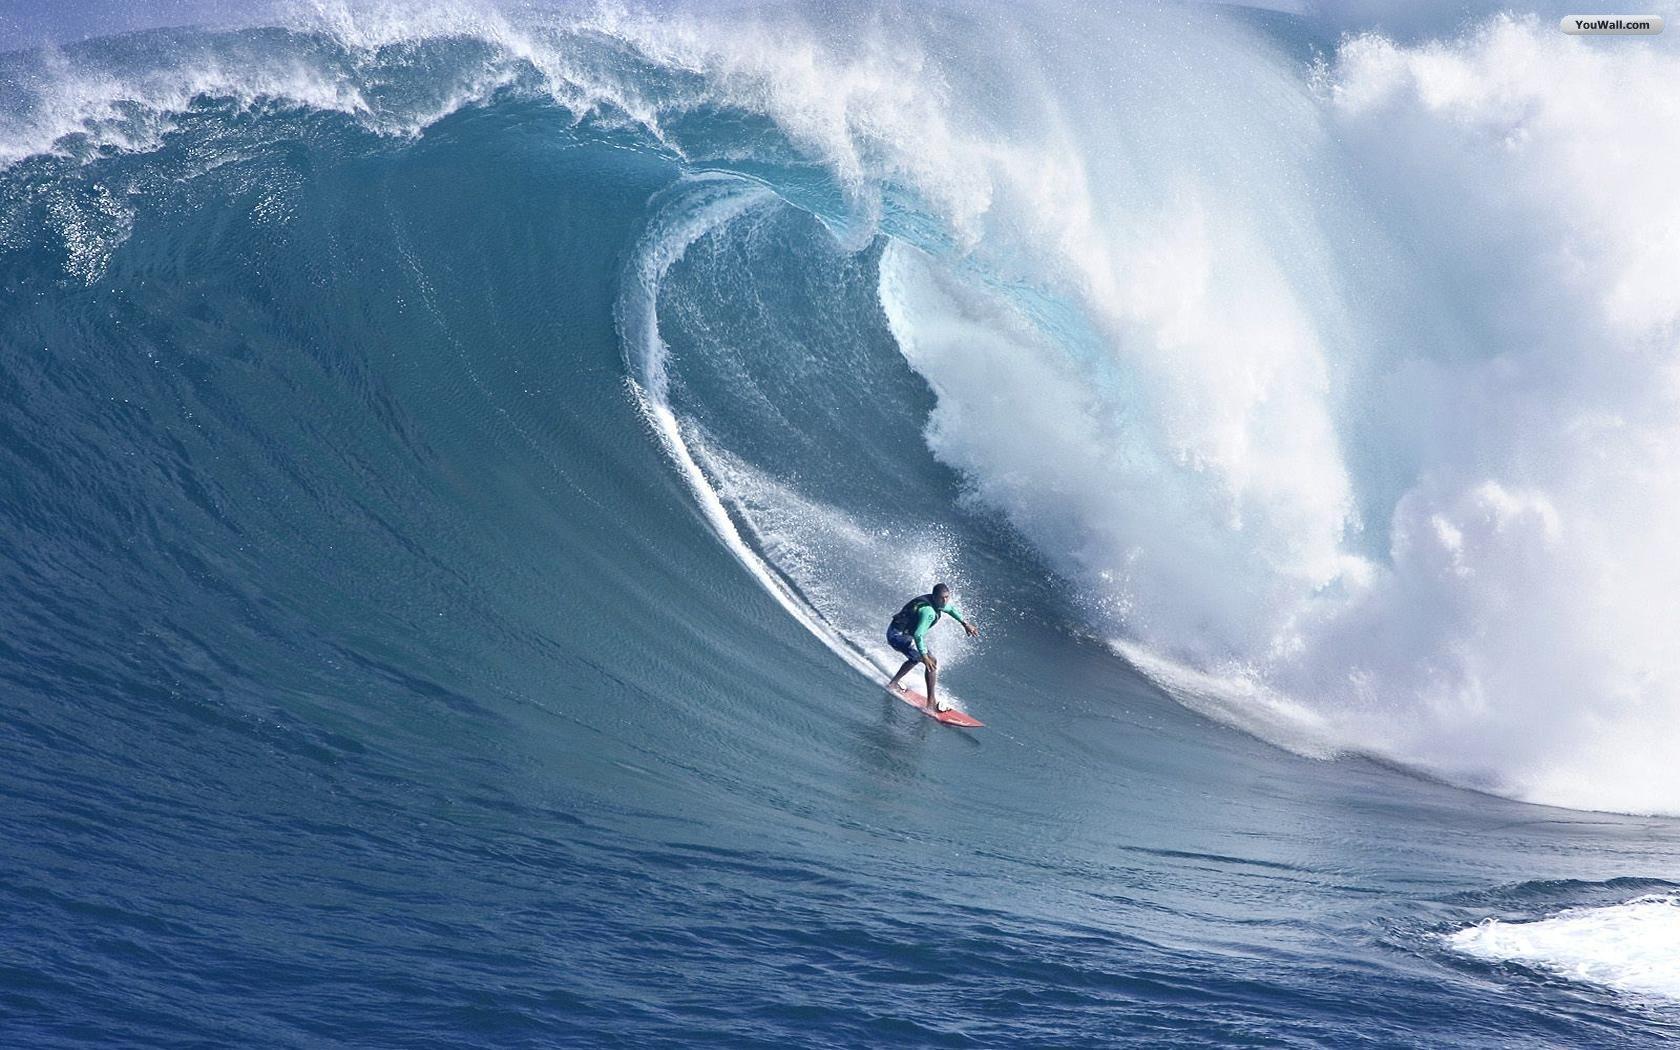 Surf Big Wave hd Wallpaper High Quality WallpapersWallpaper Desktop 1680x1050